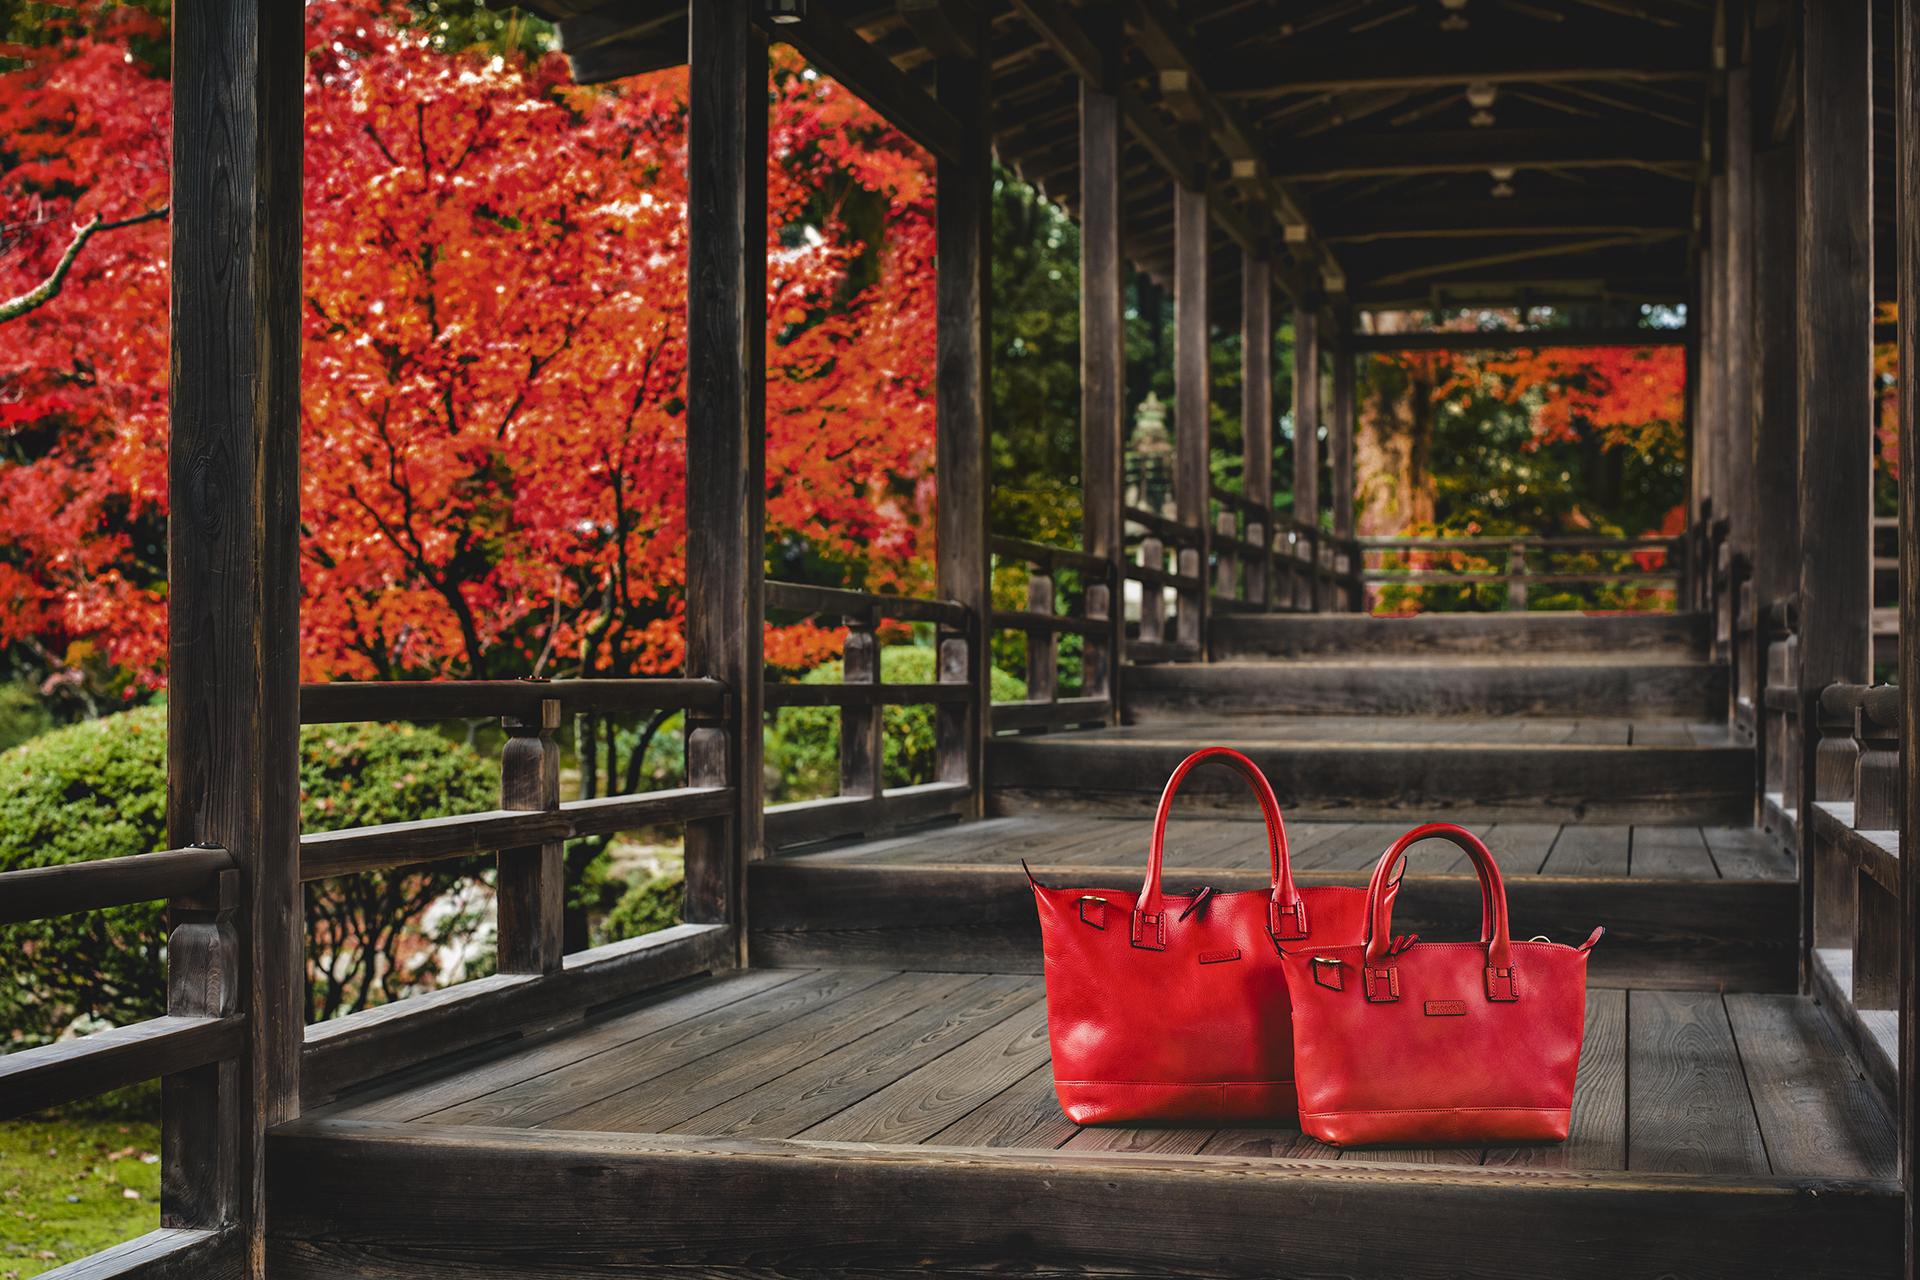 大覚寺 京都の紅葉